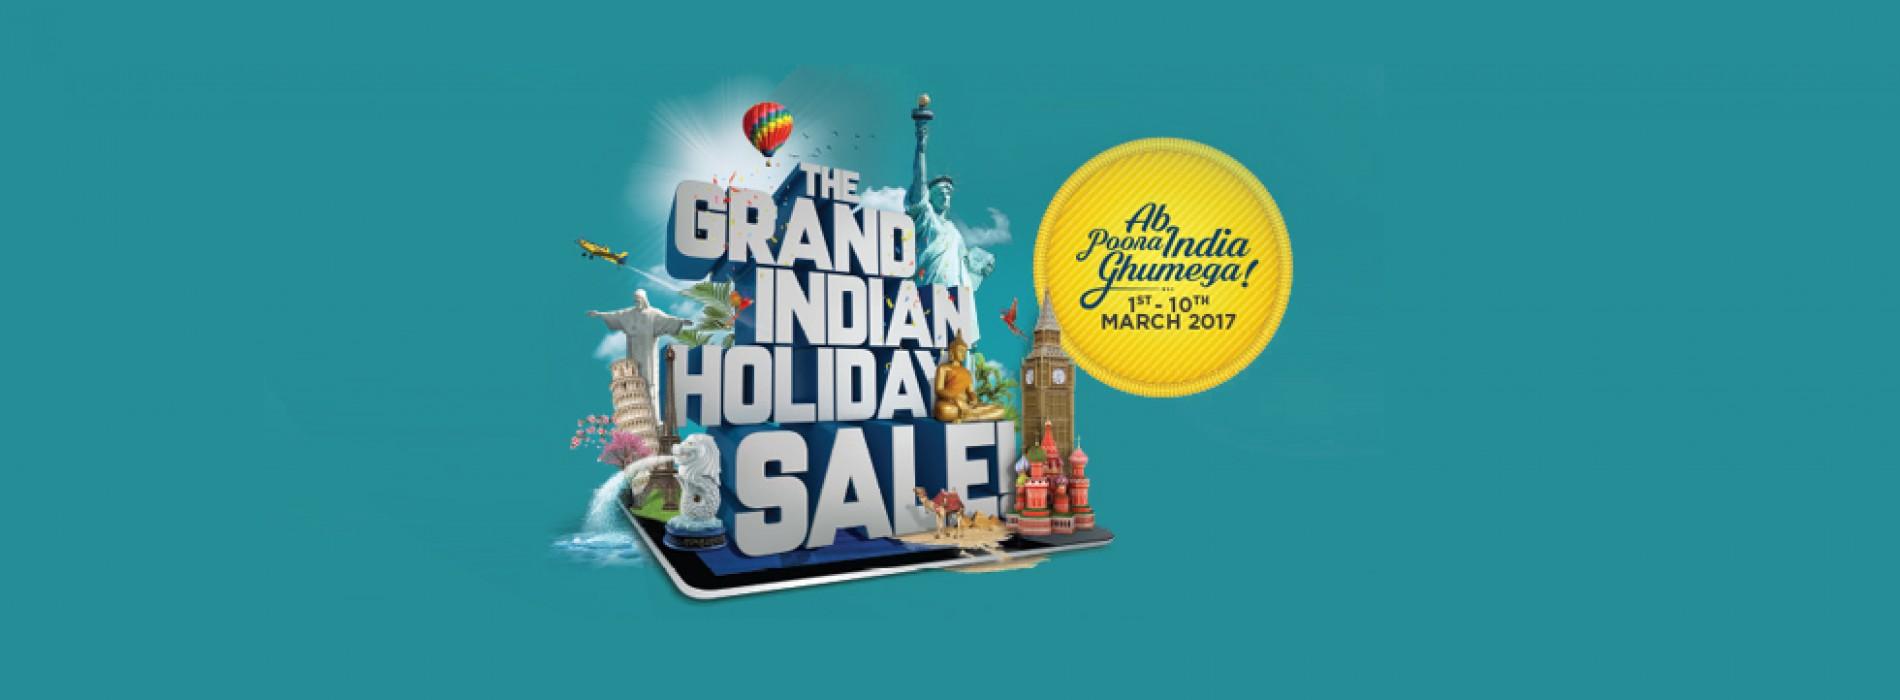 Thomas Cook India creates a strategic annual property to expand India's holiday market